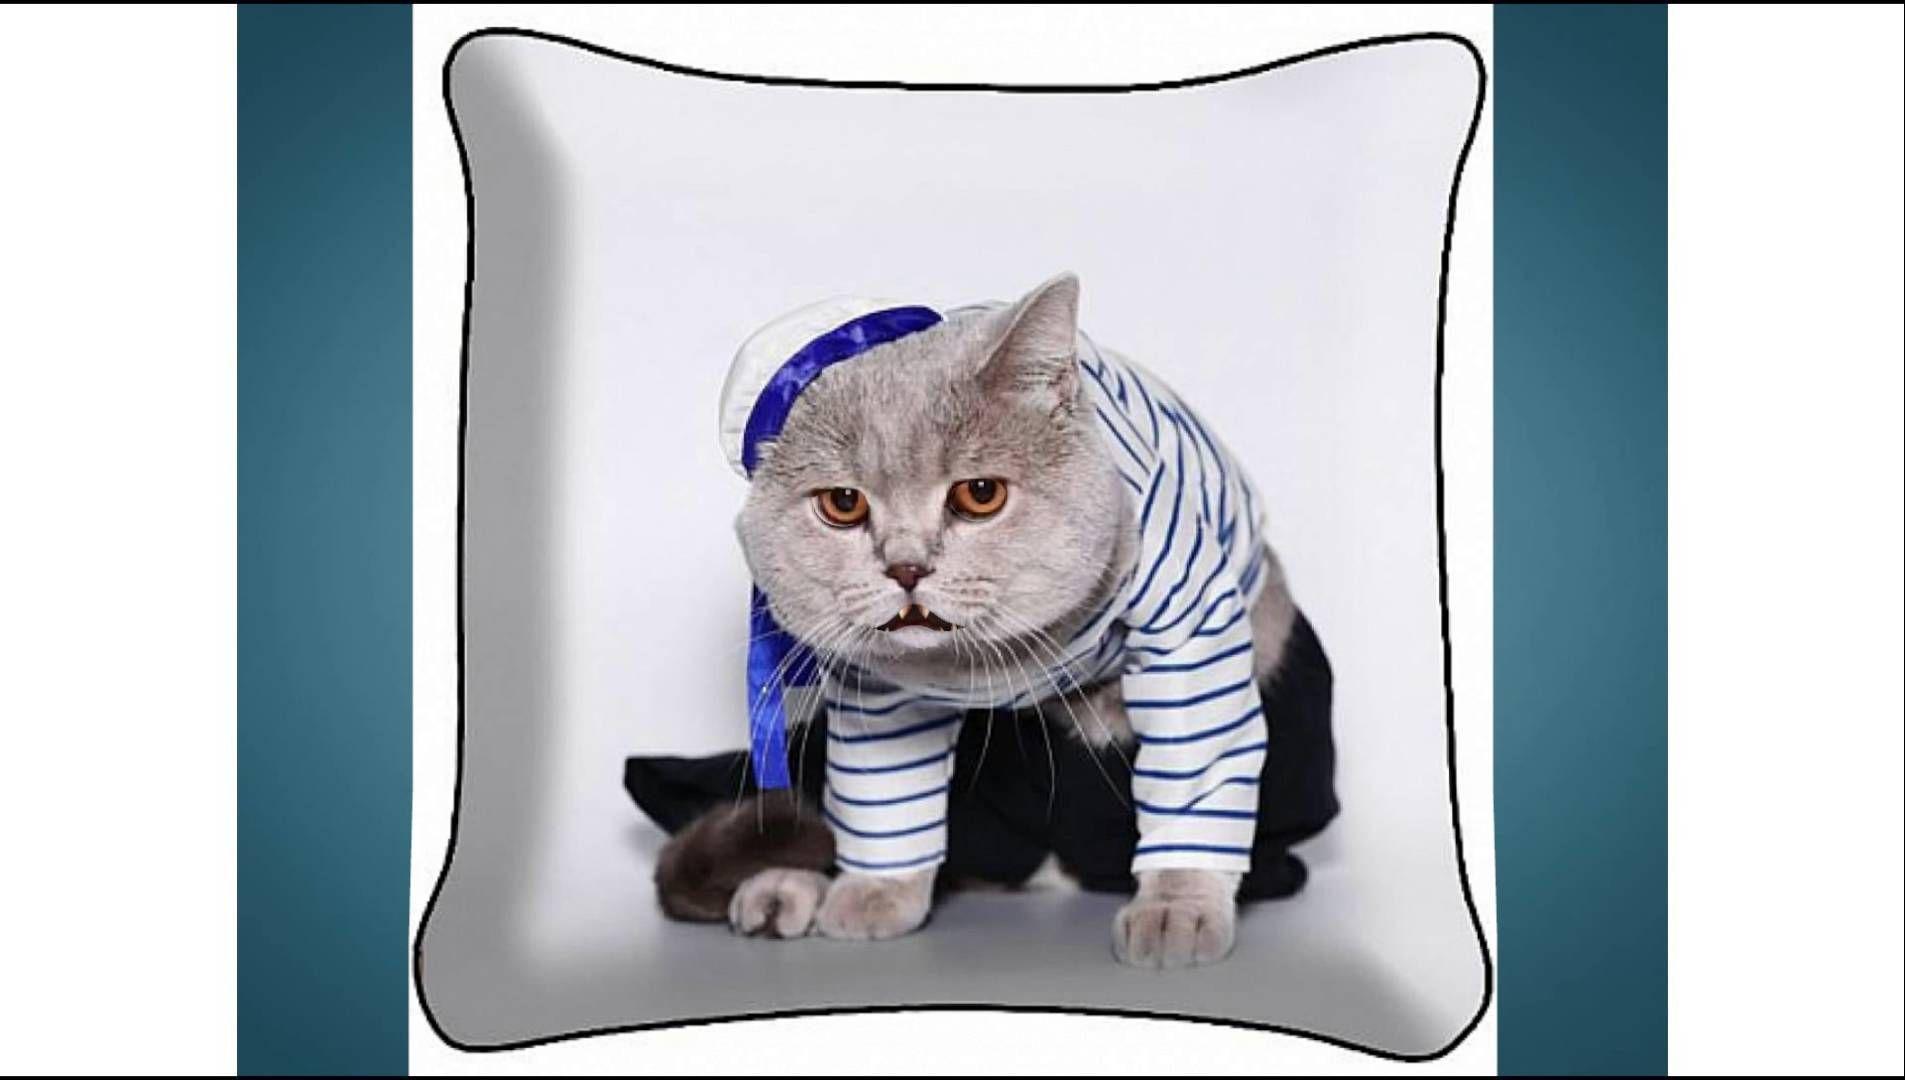 Поздравление кота матроскина с днем рождения фото 311